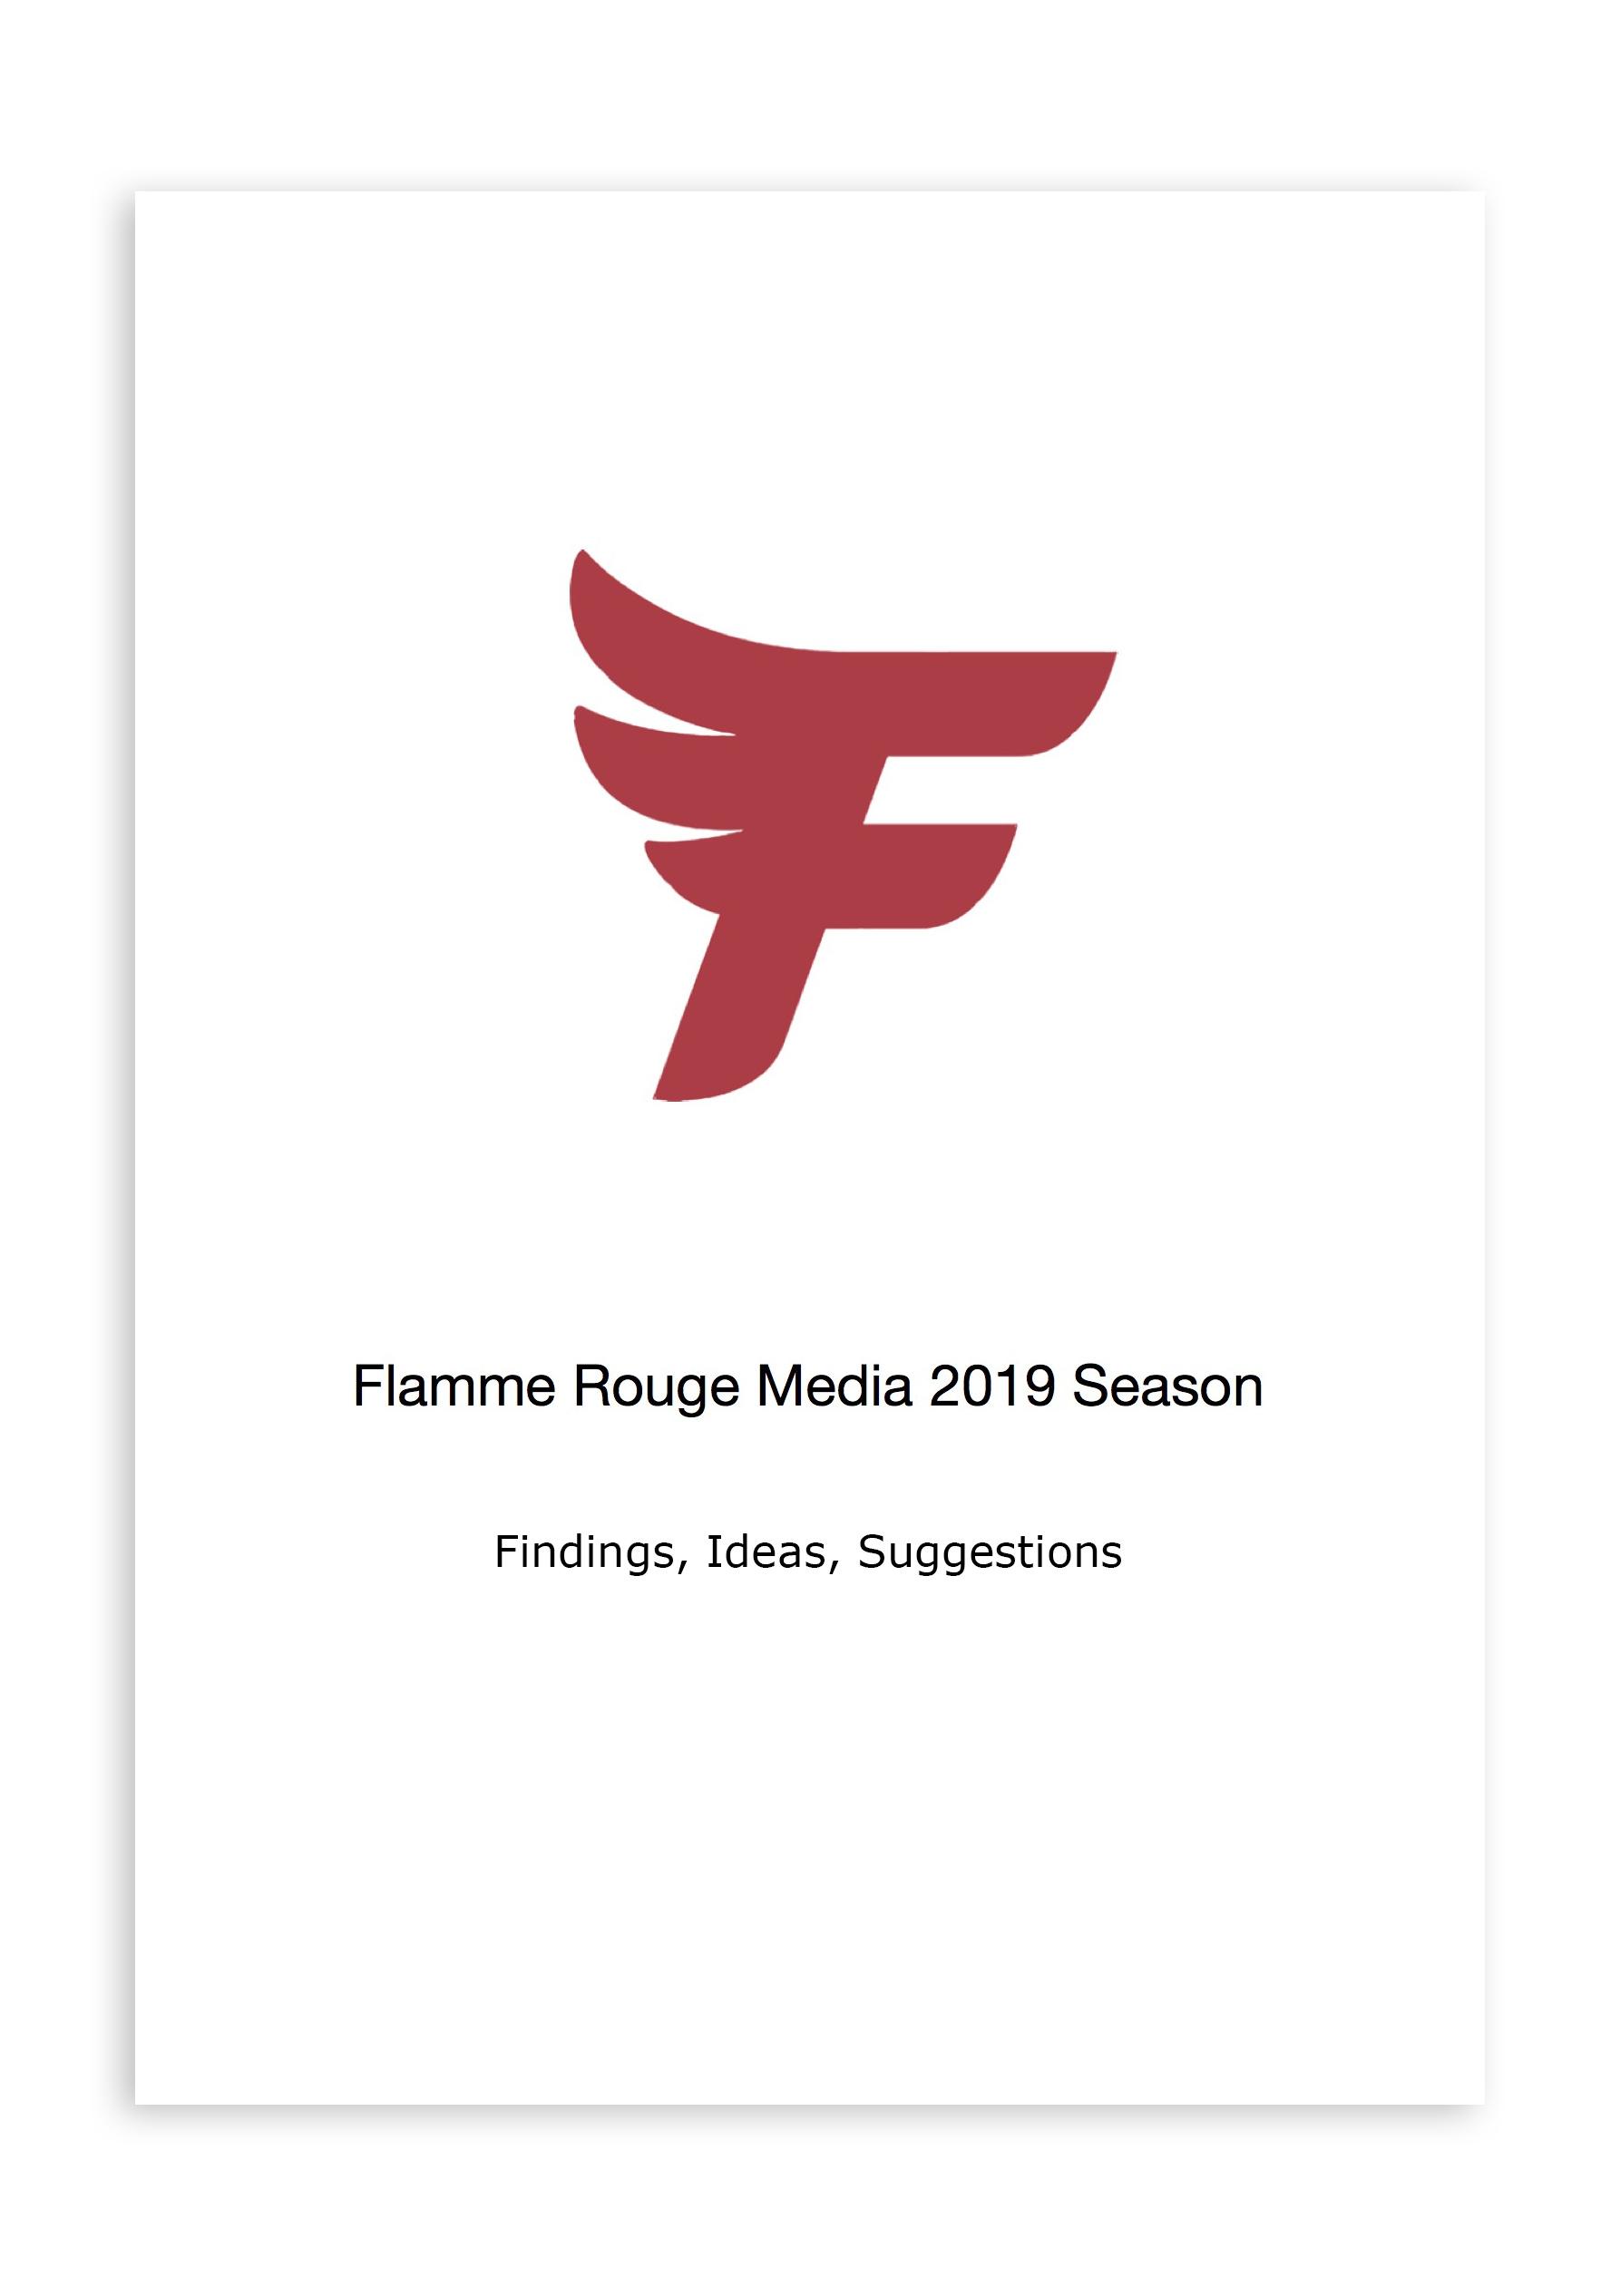 Flamme Rouge Media Proposal 3.jpg